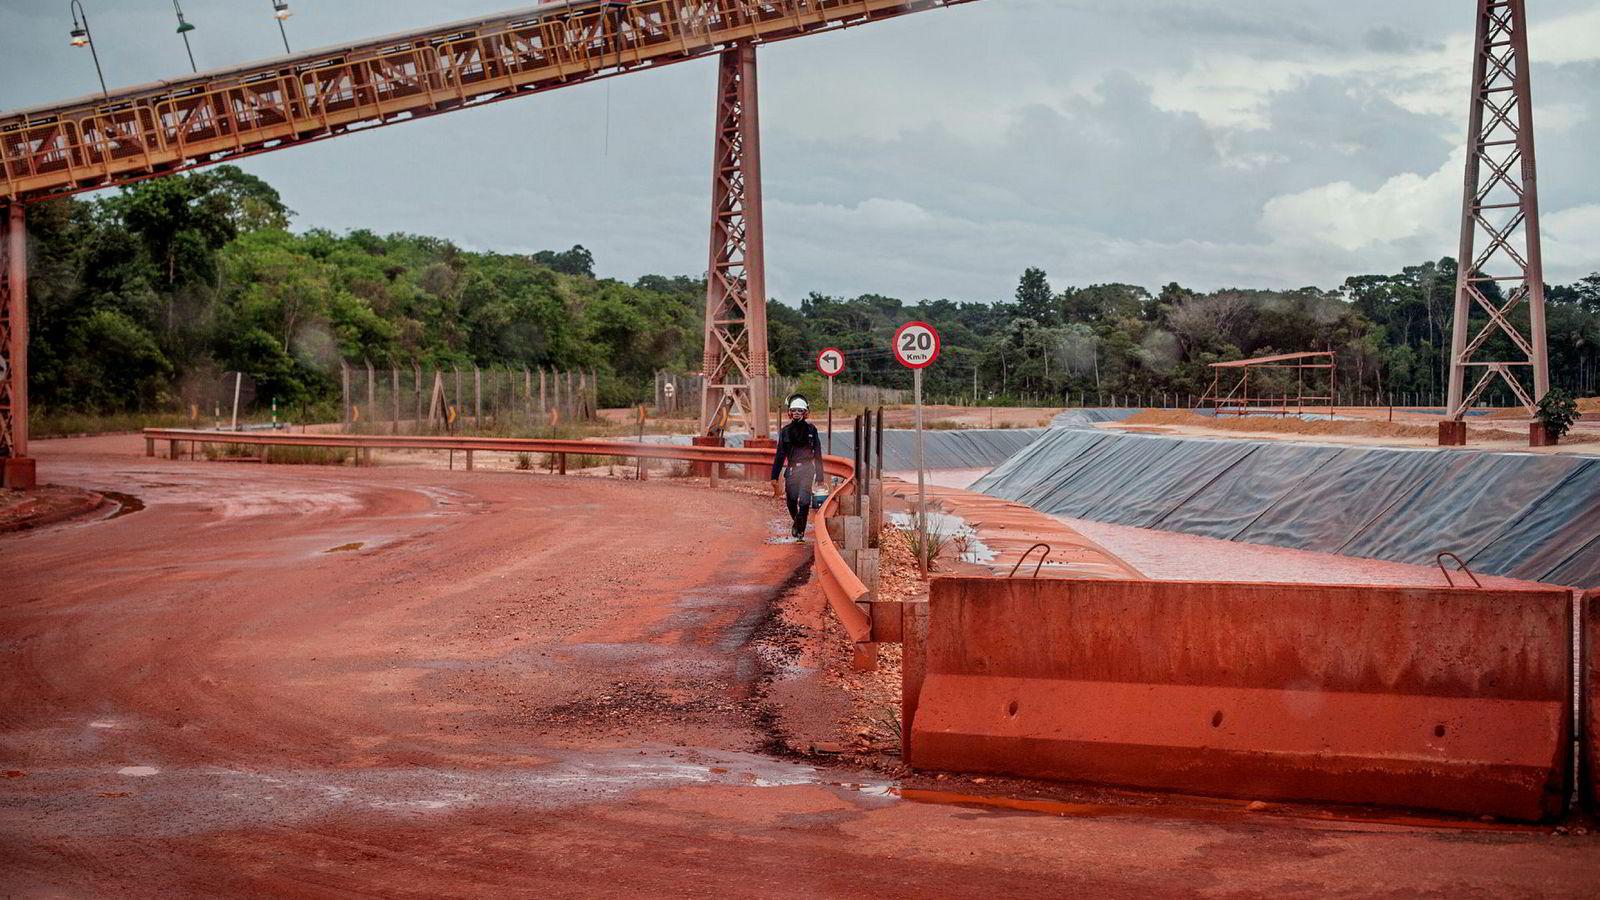 Hydro starter opp igjen aluminiumsraffineriet i Alunorte.